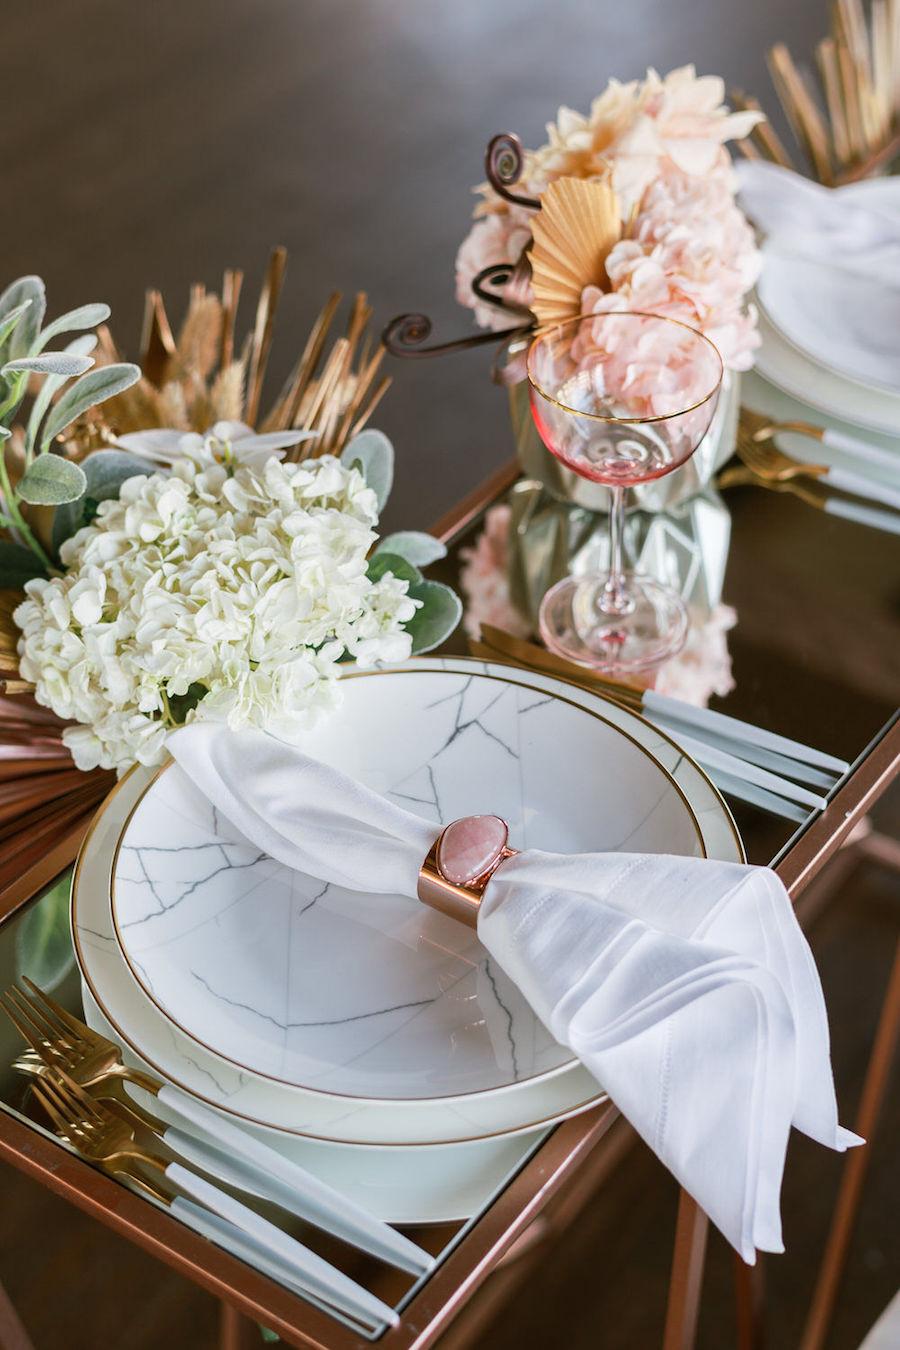 Signature Party Rentals Ft On Luxe Linen California Southern California Orange County Wedding Sea Jen Simpson Design Hemstitch Napkin Indoor Reception